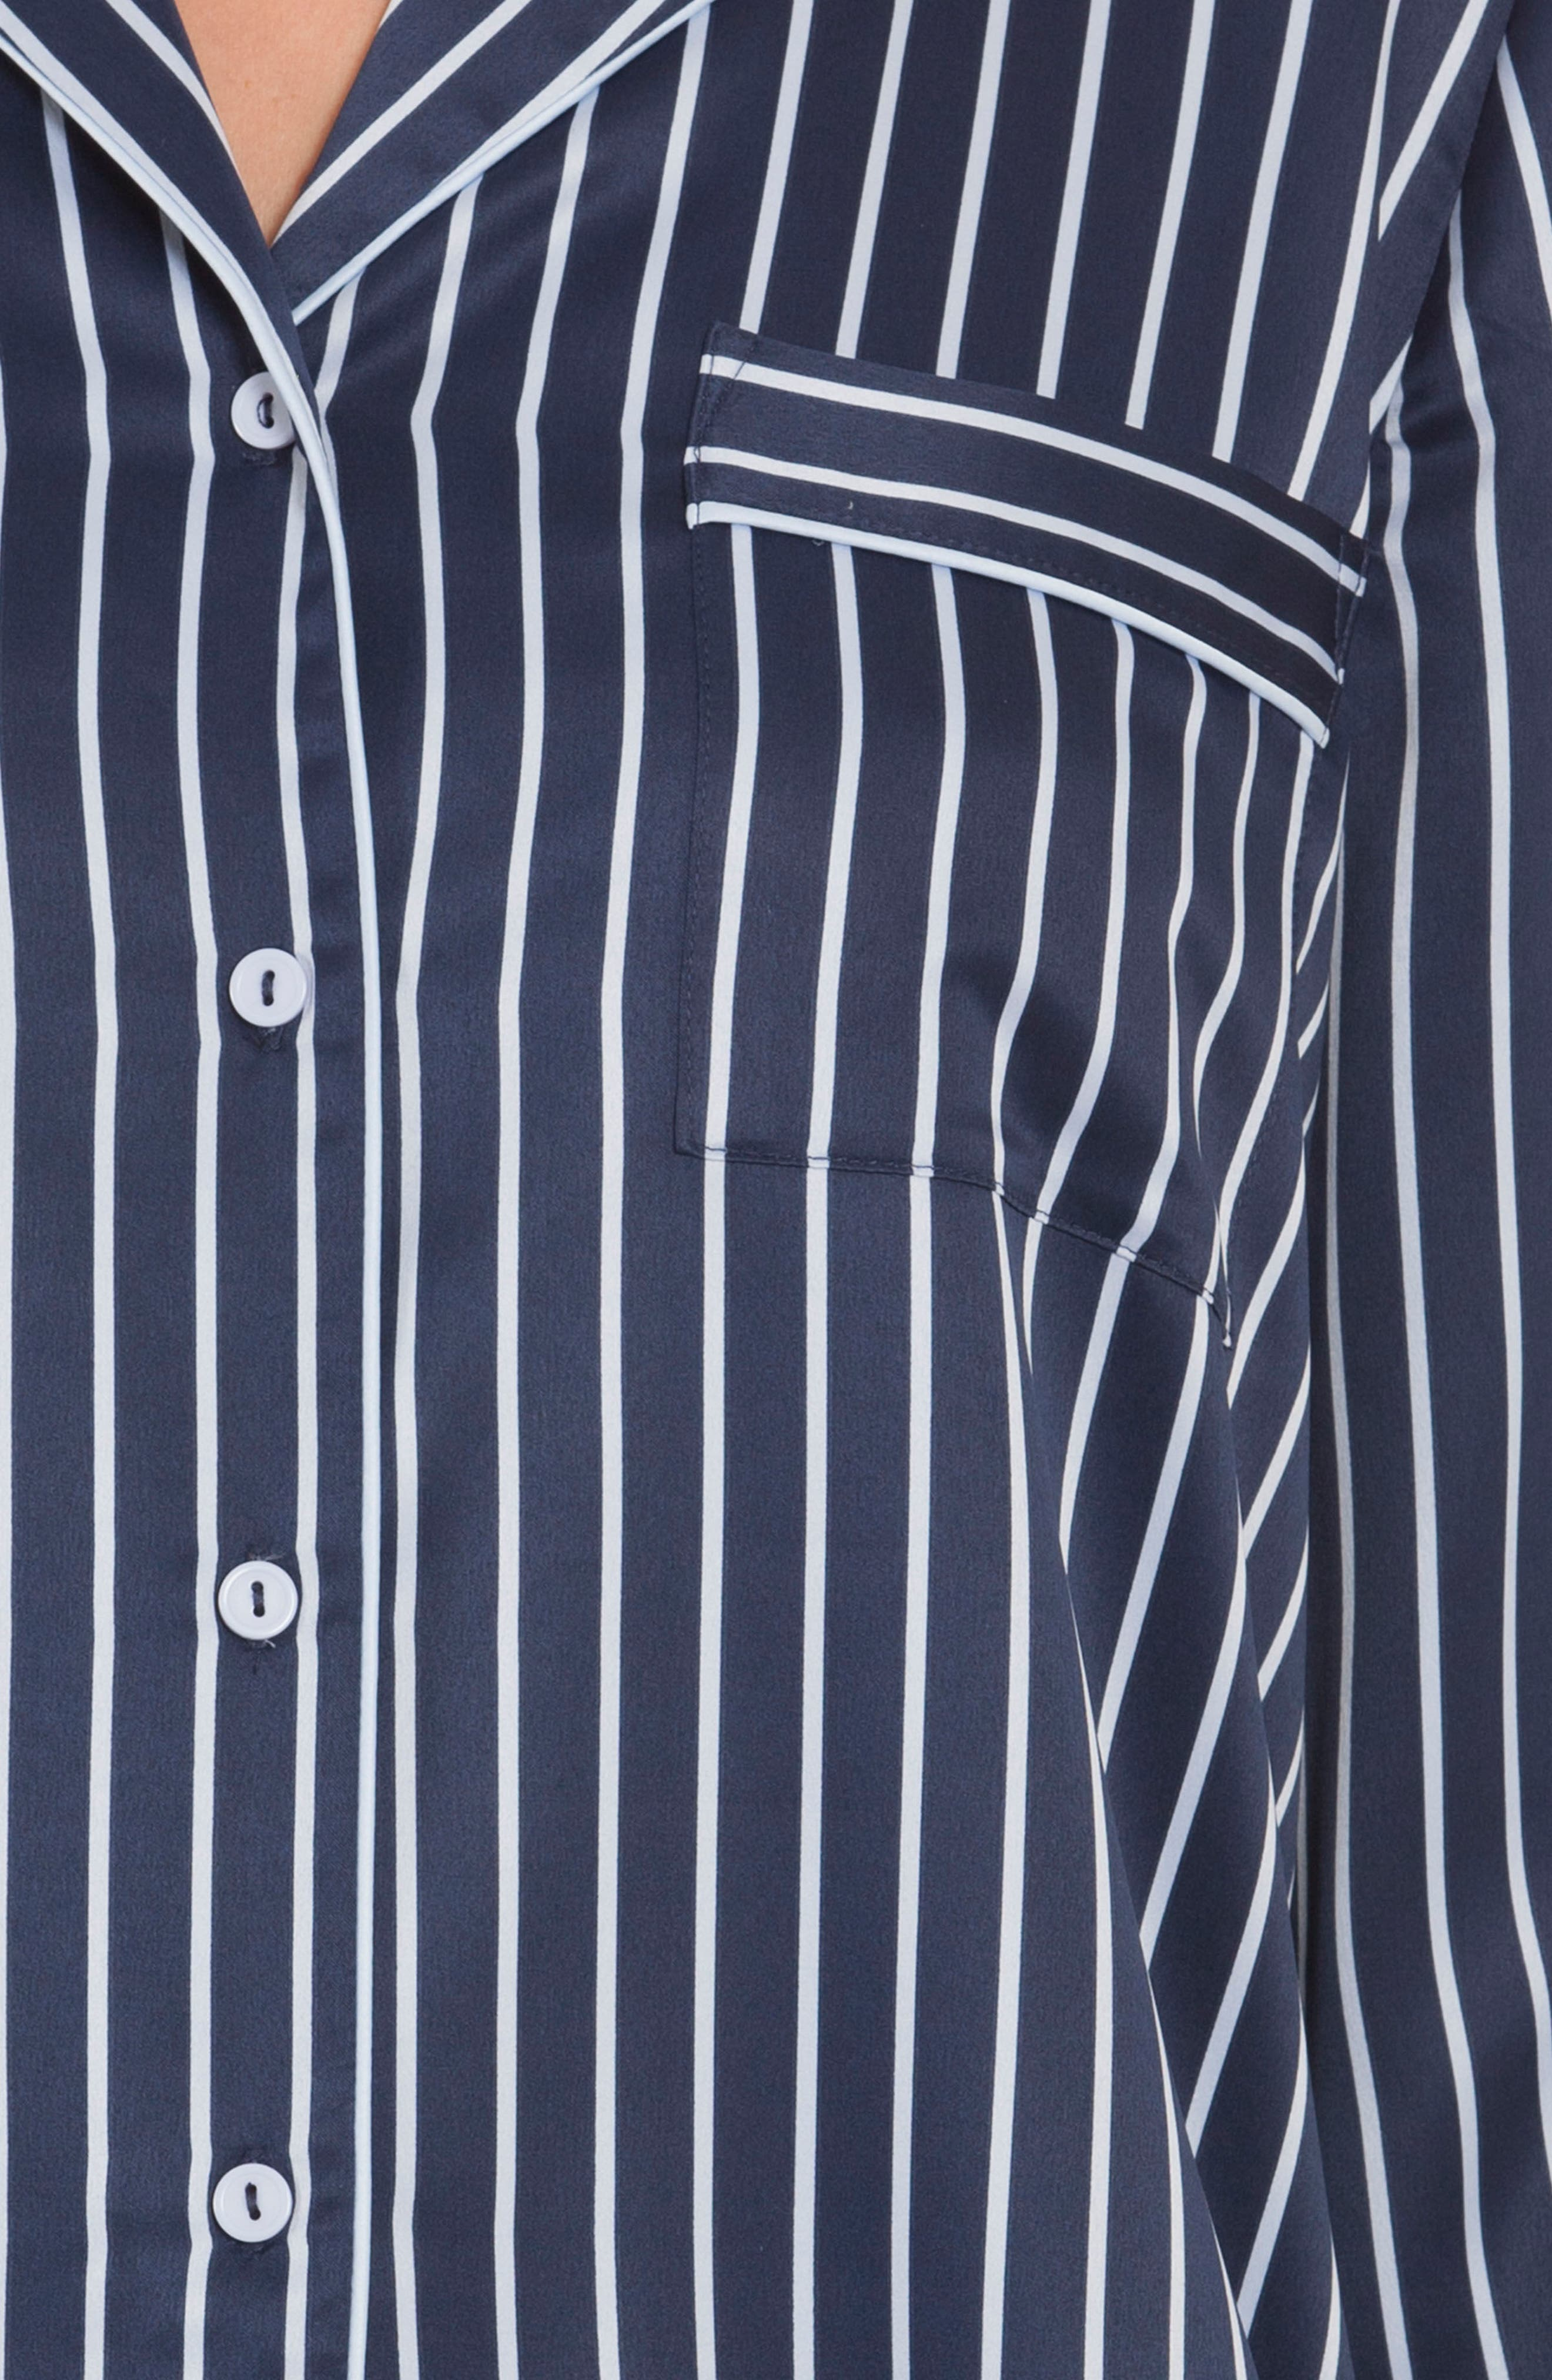 Short Pajamas,                             Alternate thumbnail 4, color,                             400